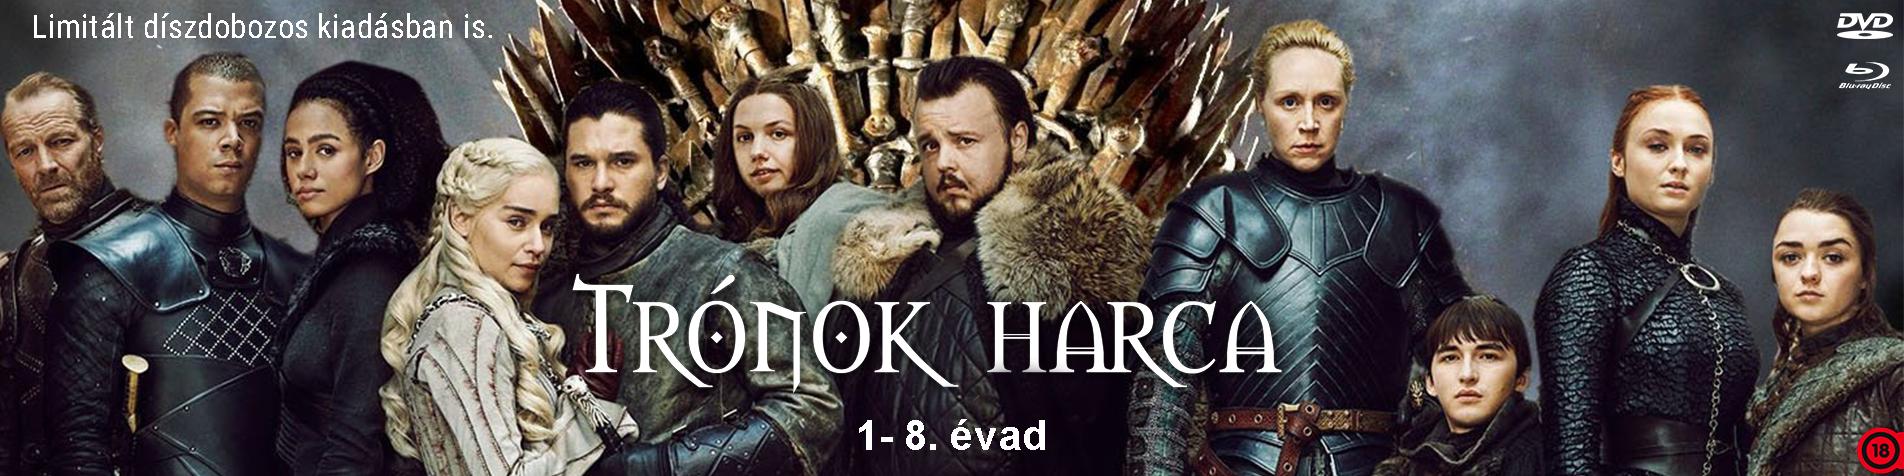 Tónok 8 - DVD